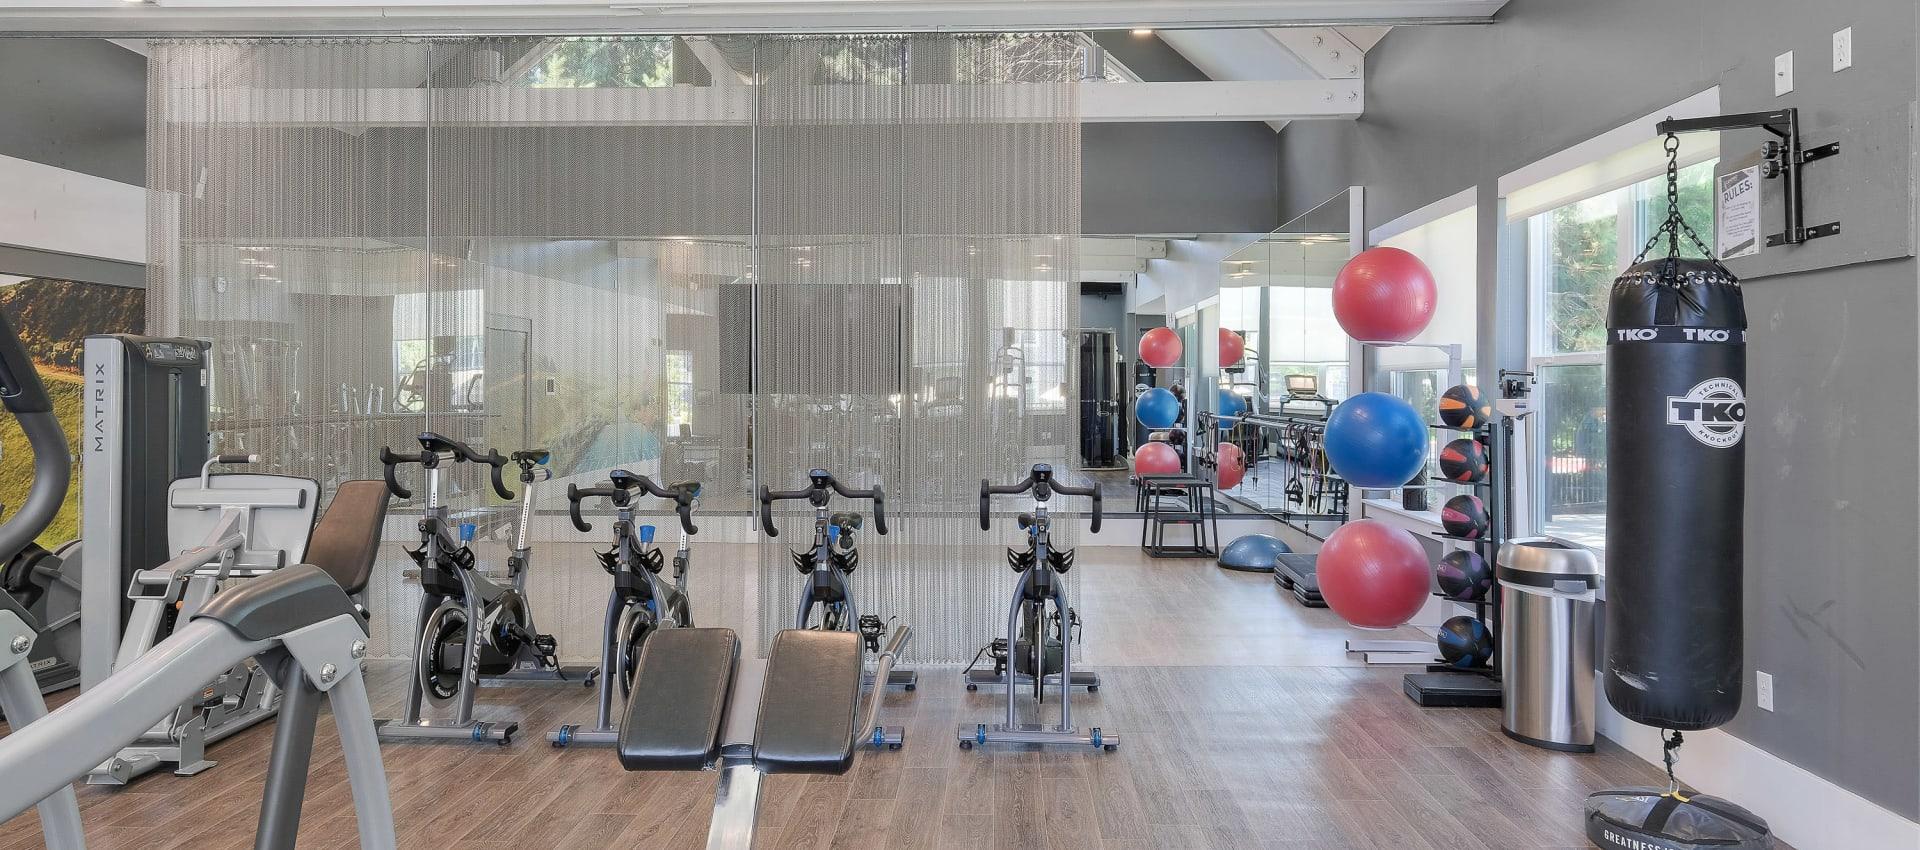 Fitness center at Centro Apartment Homes in Hillsboro, Oregon